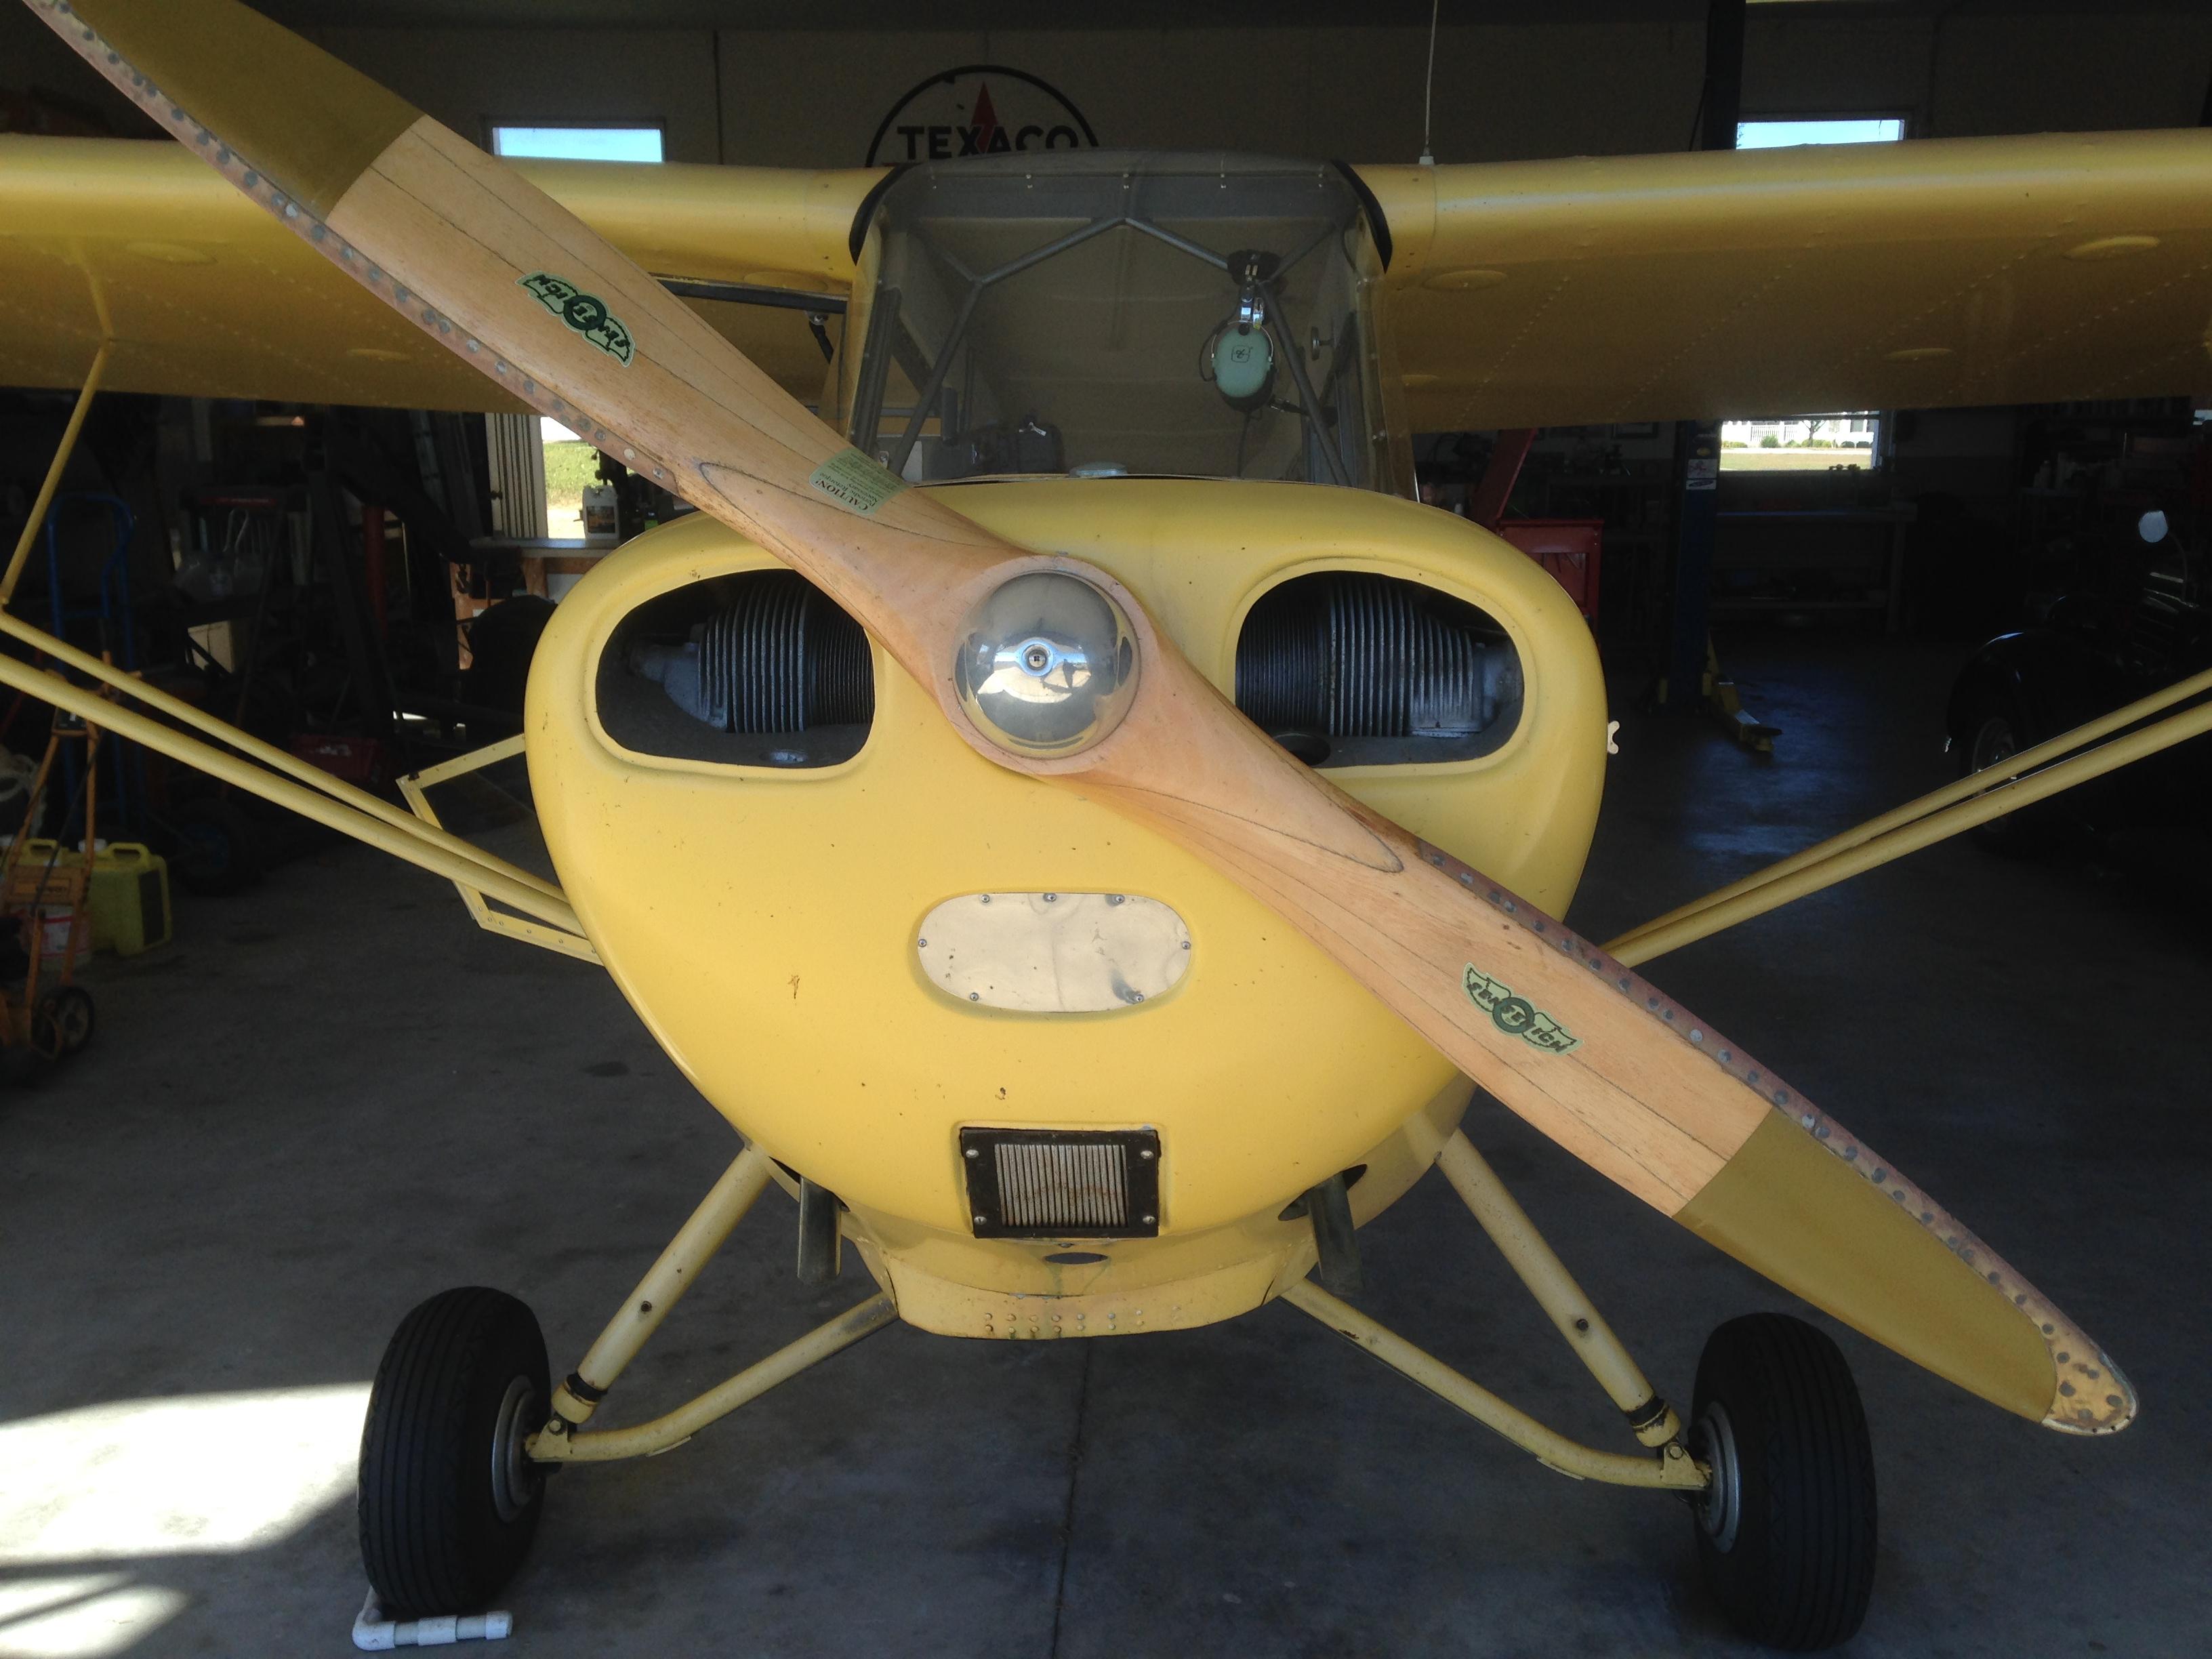 Ralph's Plane